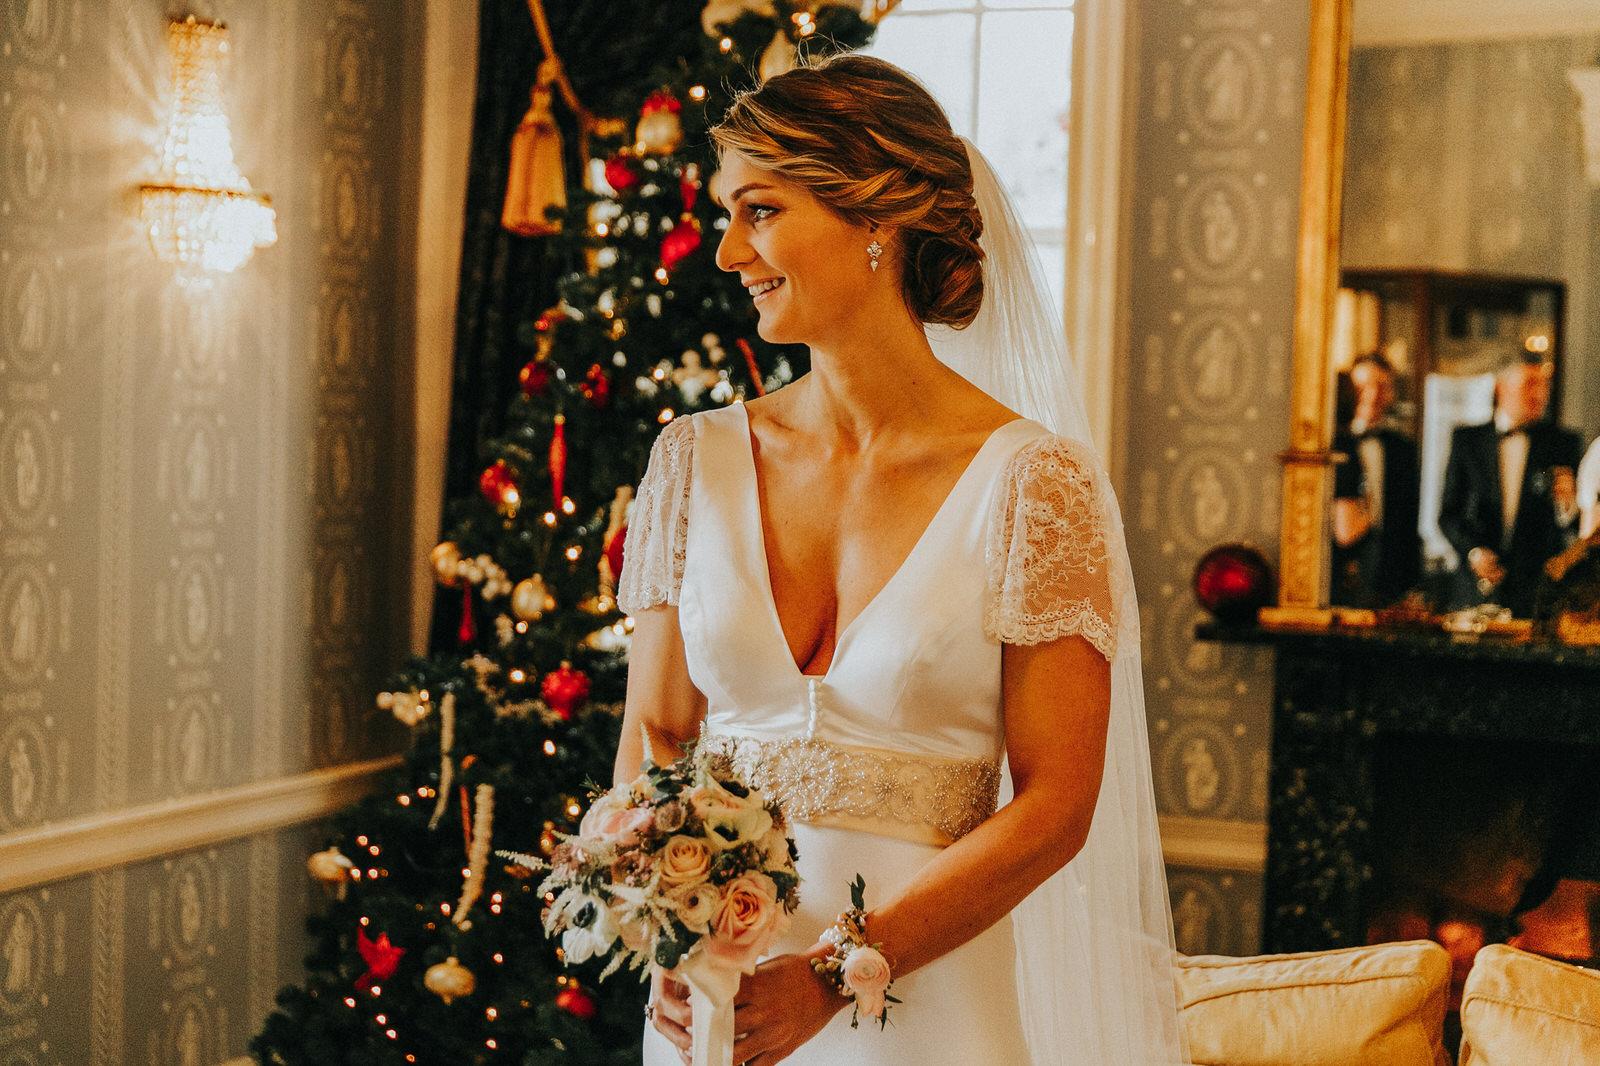 Dunbrody_House_Wedding_photographer_061.jpg